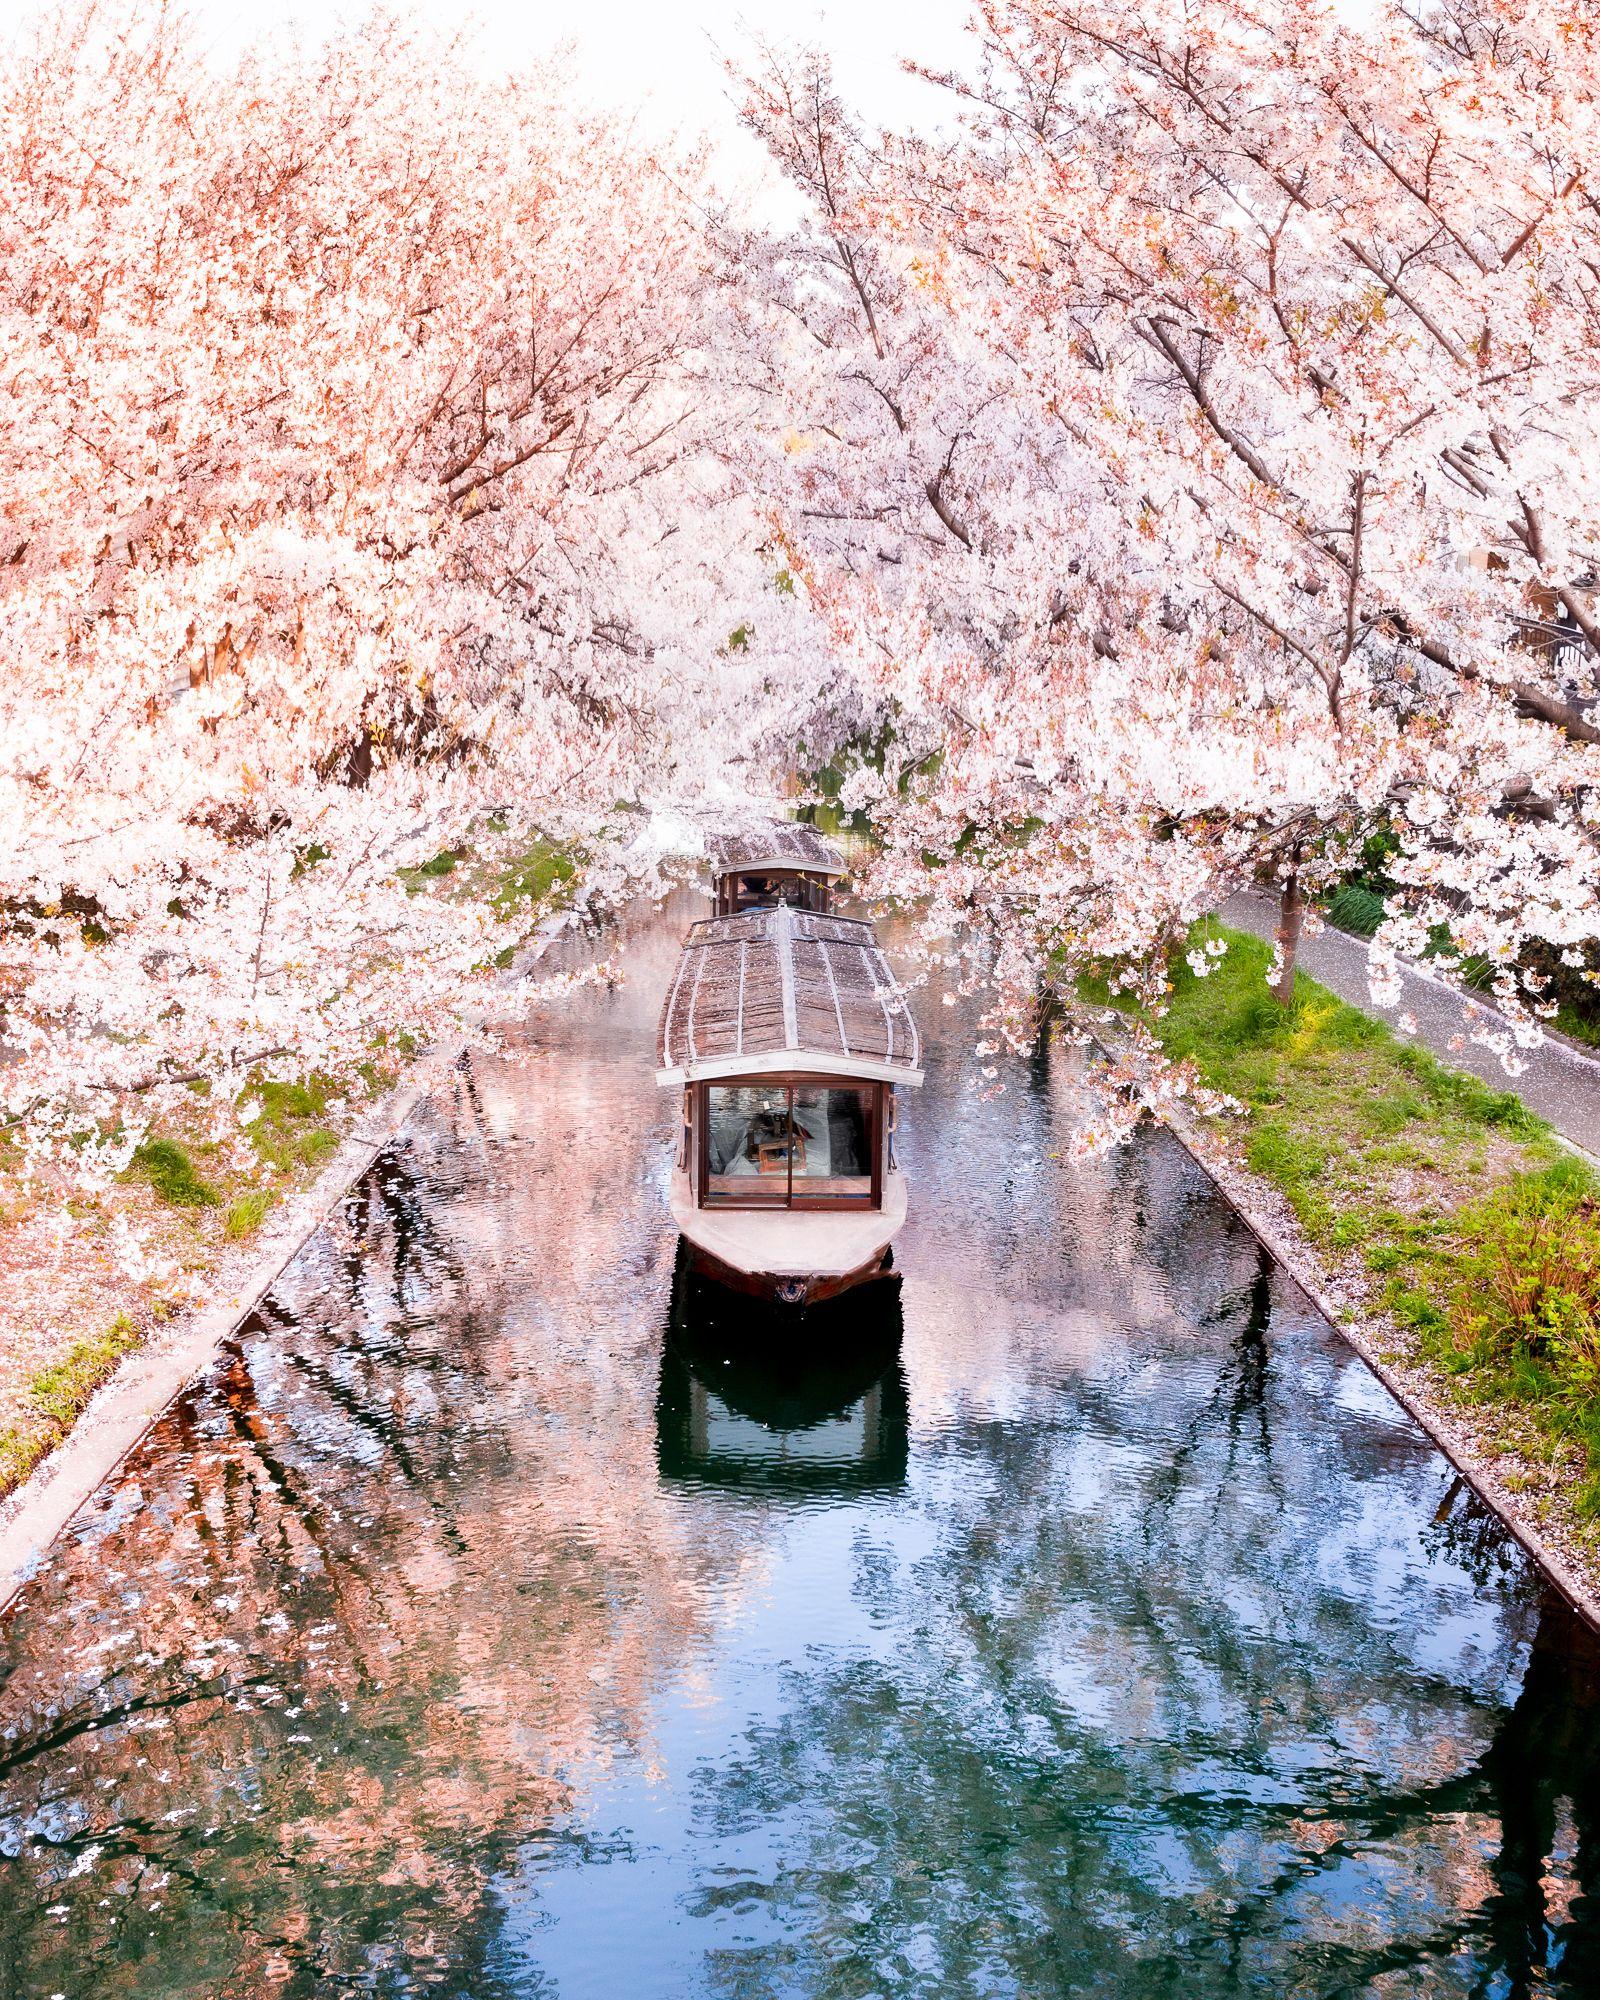 Best Sakura Photo In Japan Cherry Blossom In Fushimi Ward In Kyoto Cherry Blossom Japan Photo Spots Cherry Blossom